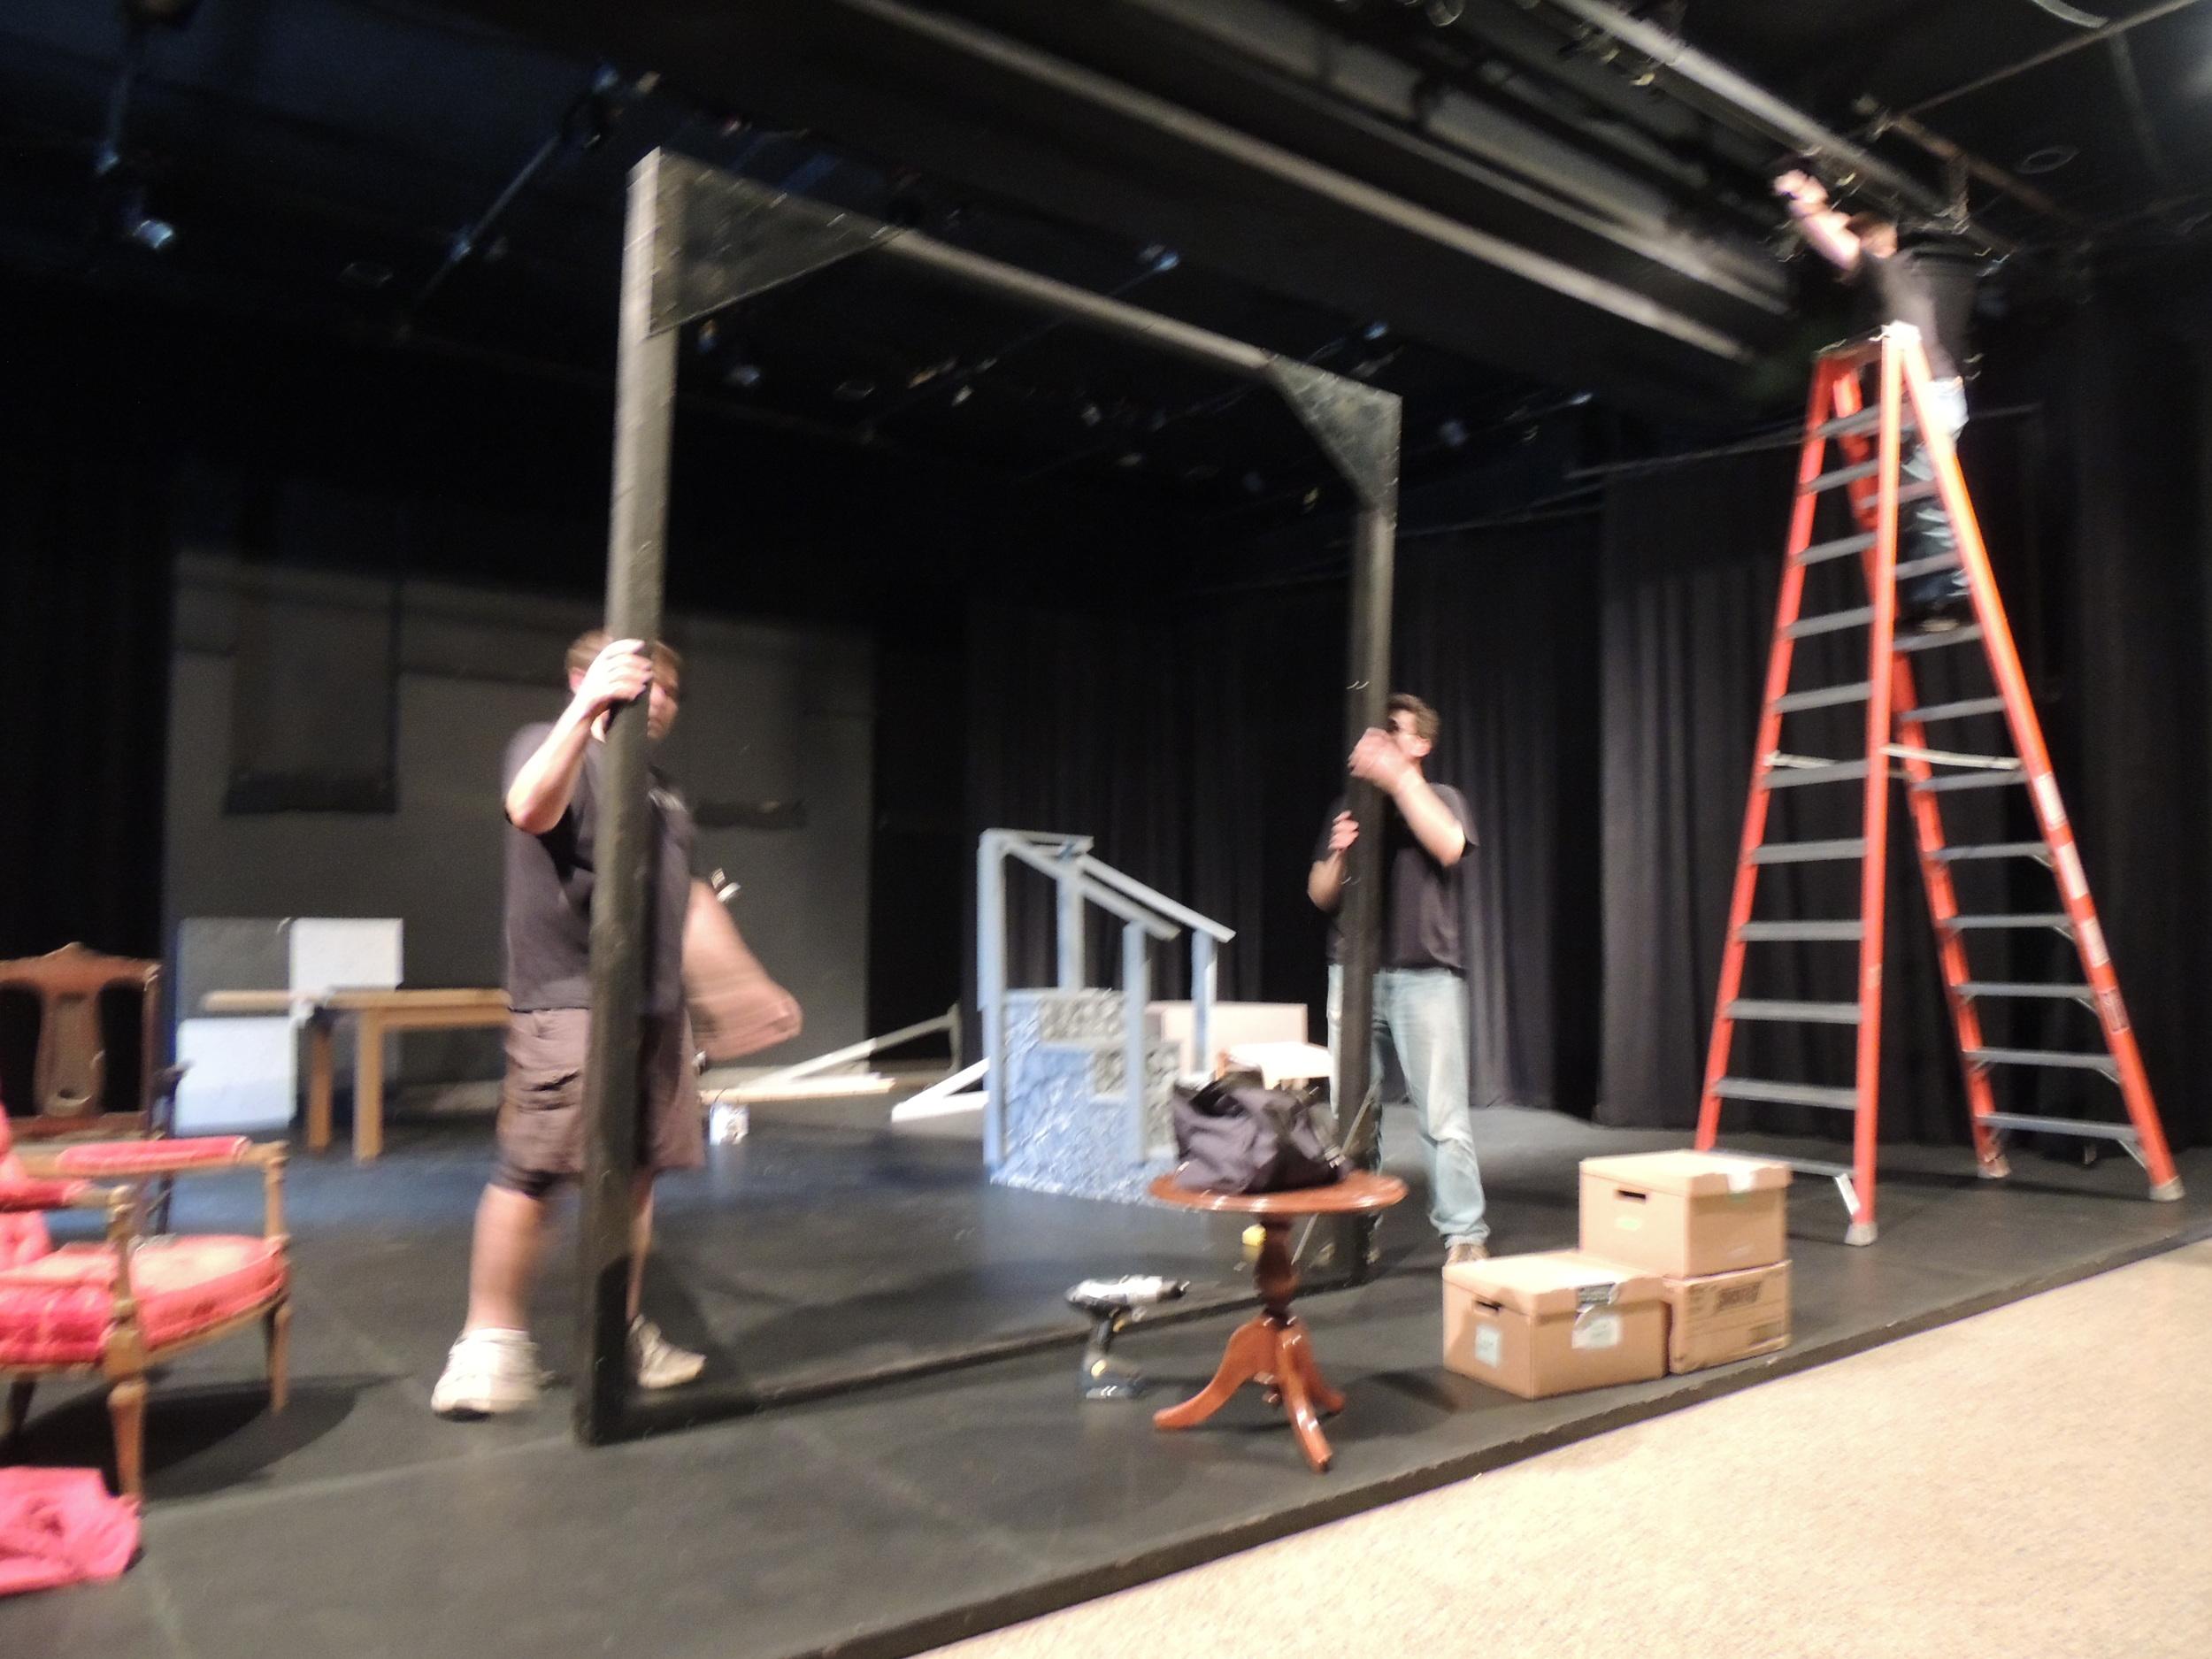 Volunteers constructamazing sets - So actors have great backdrops!